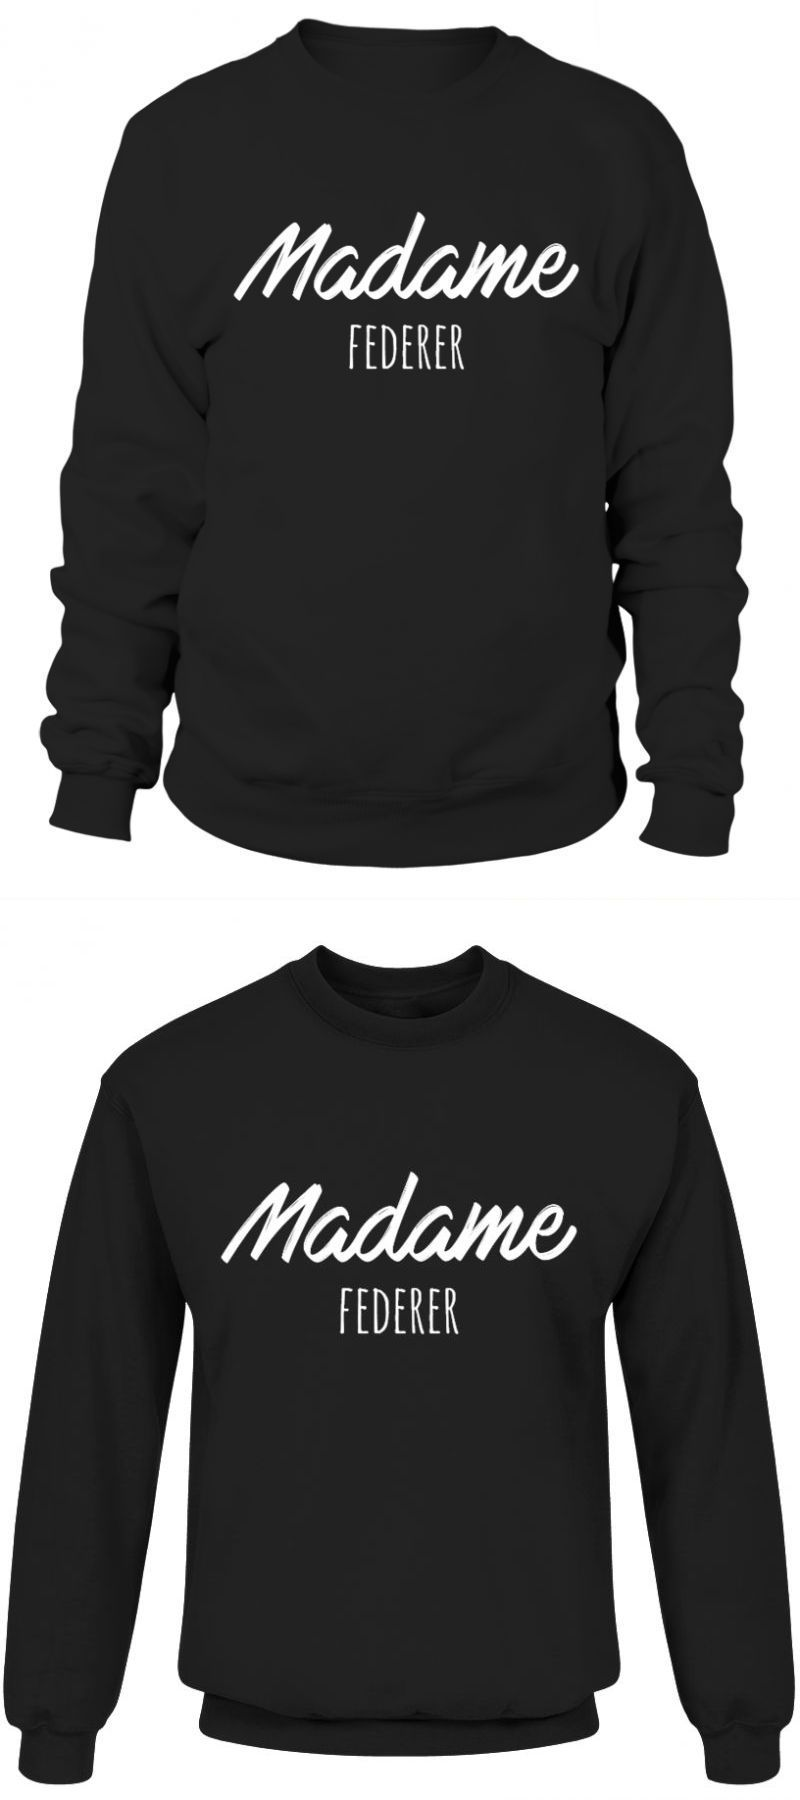 Table tennis t shirt malaysia madame federer tennis t shirt with skull logo #table #tennis #shirt #malaysia #madame #federer #with #skull #logo #kinder #sweatshirt #unisex #premium #sweater